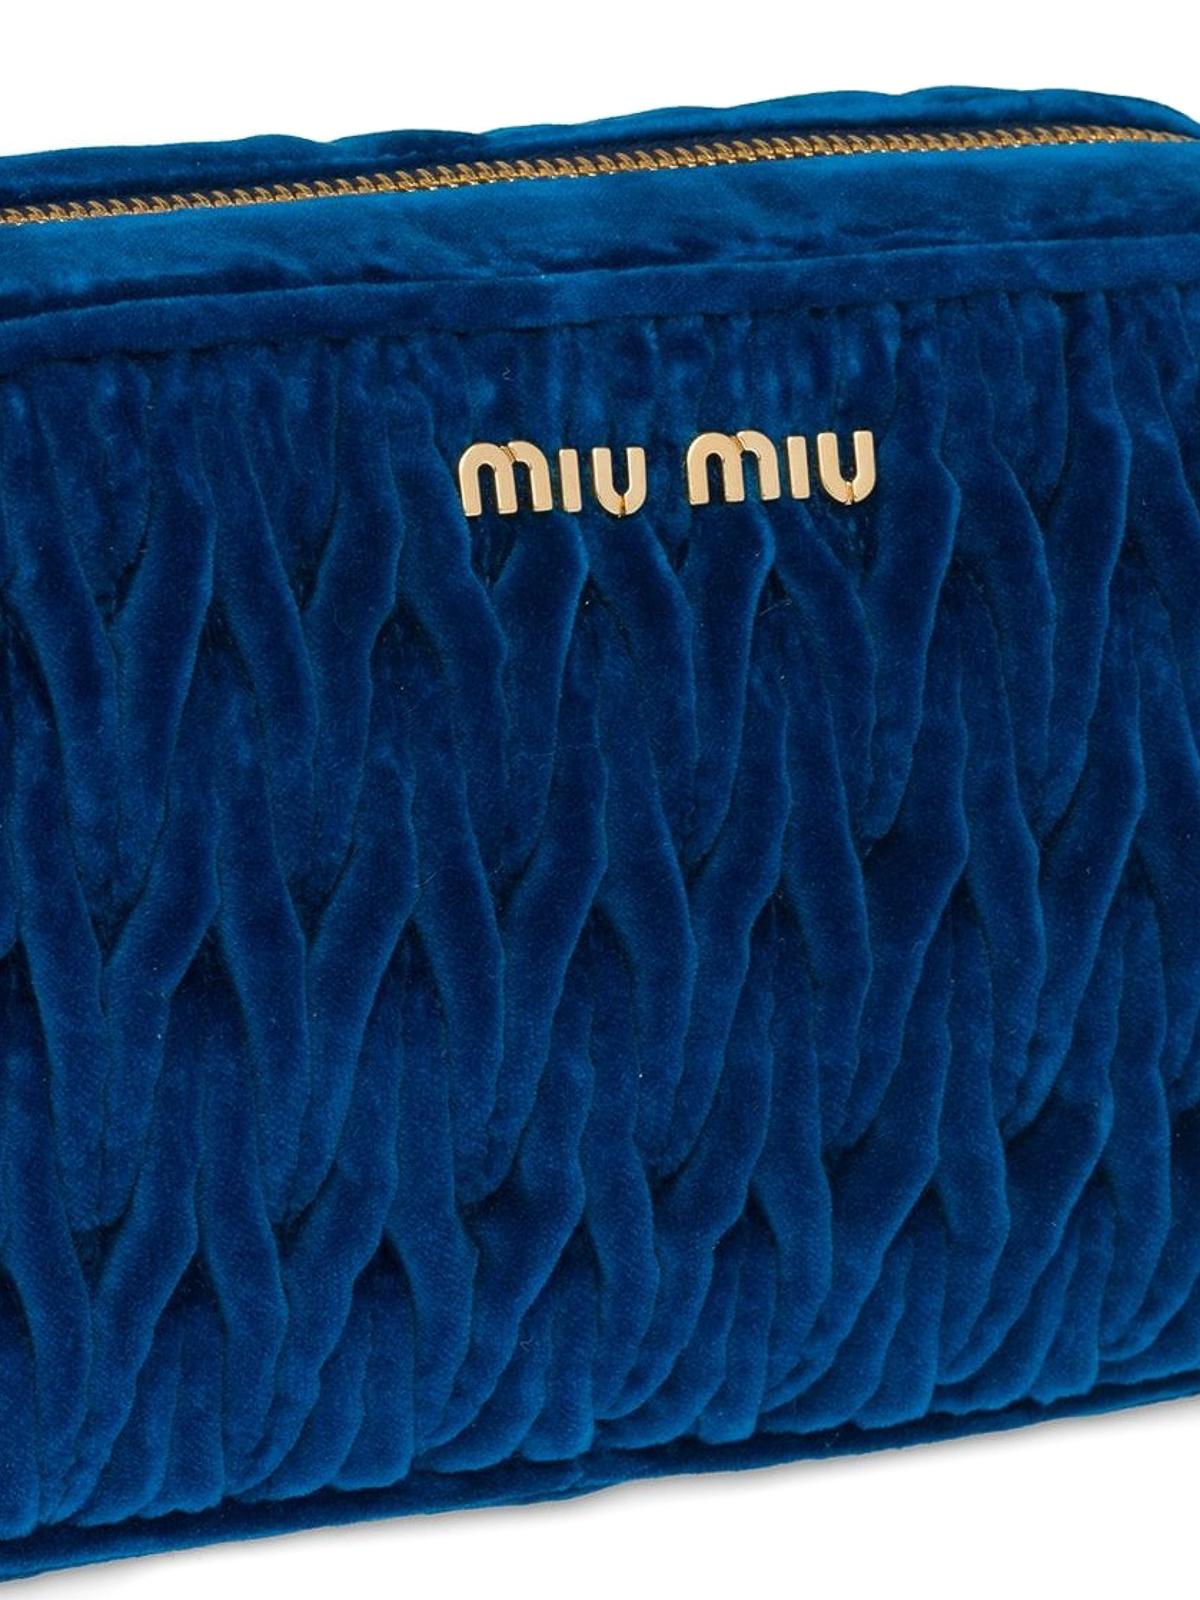 iKRIX MIU MIU  cross body bags - Blue matelassé velvet camera bag 03529a25e7e6b